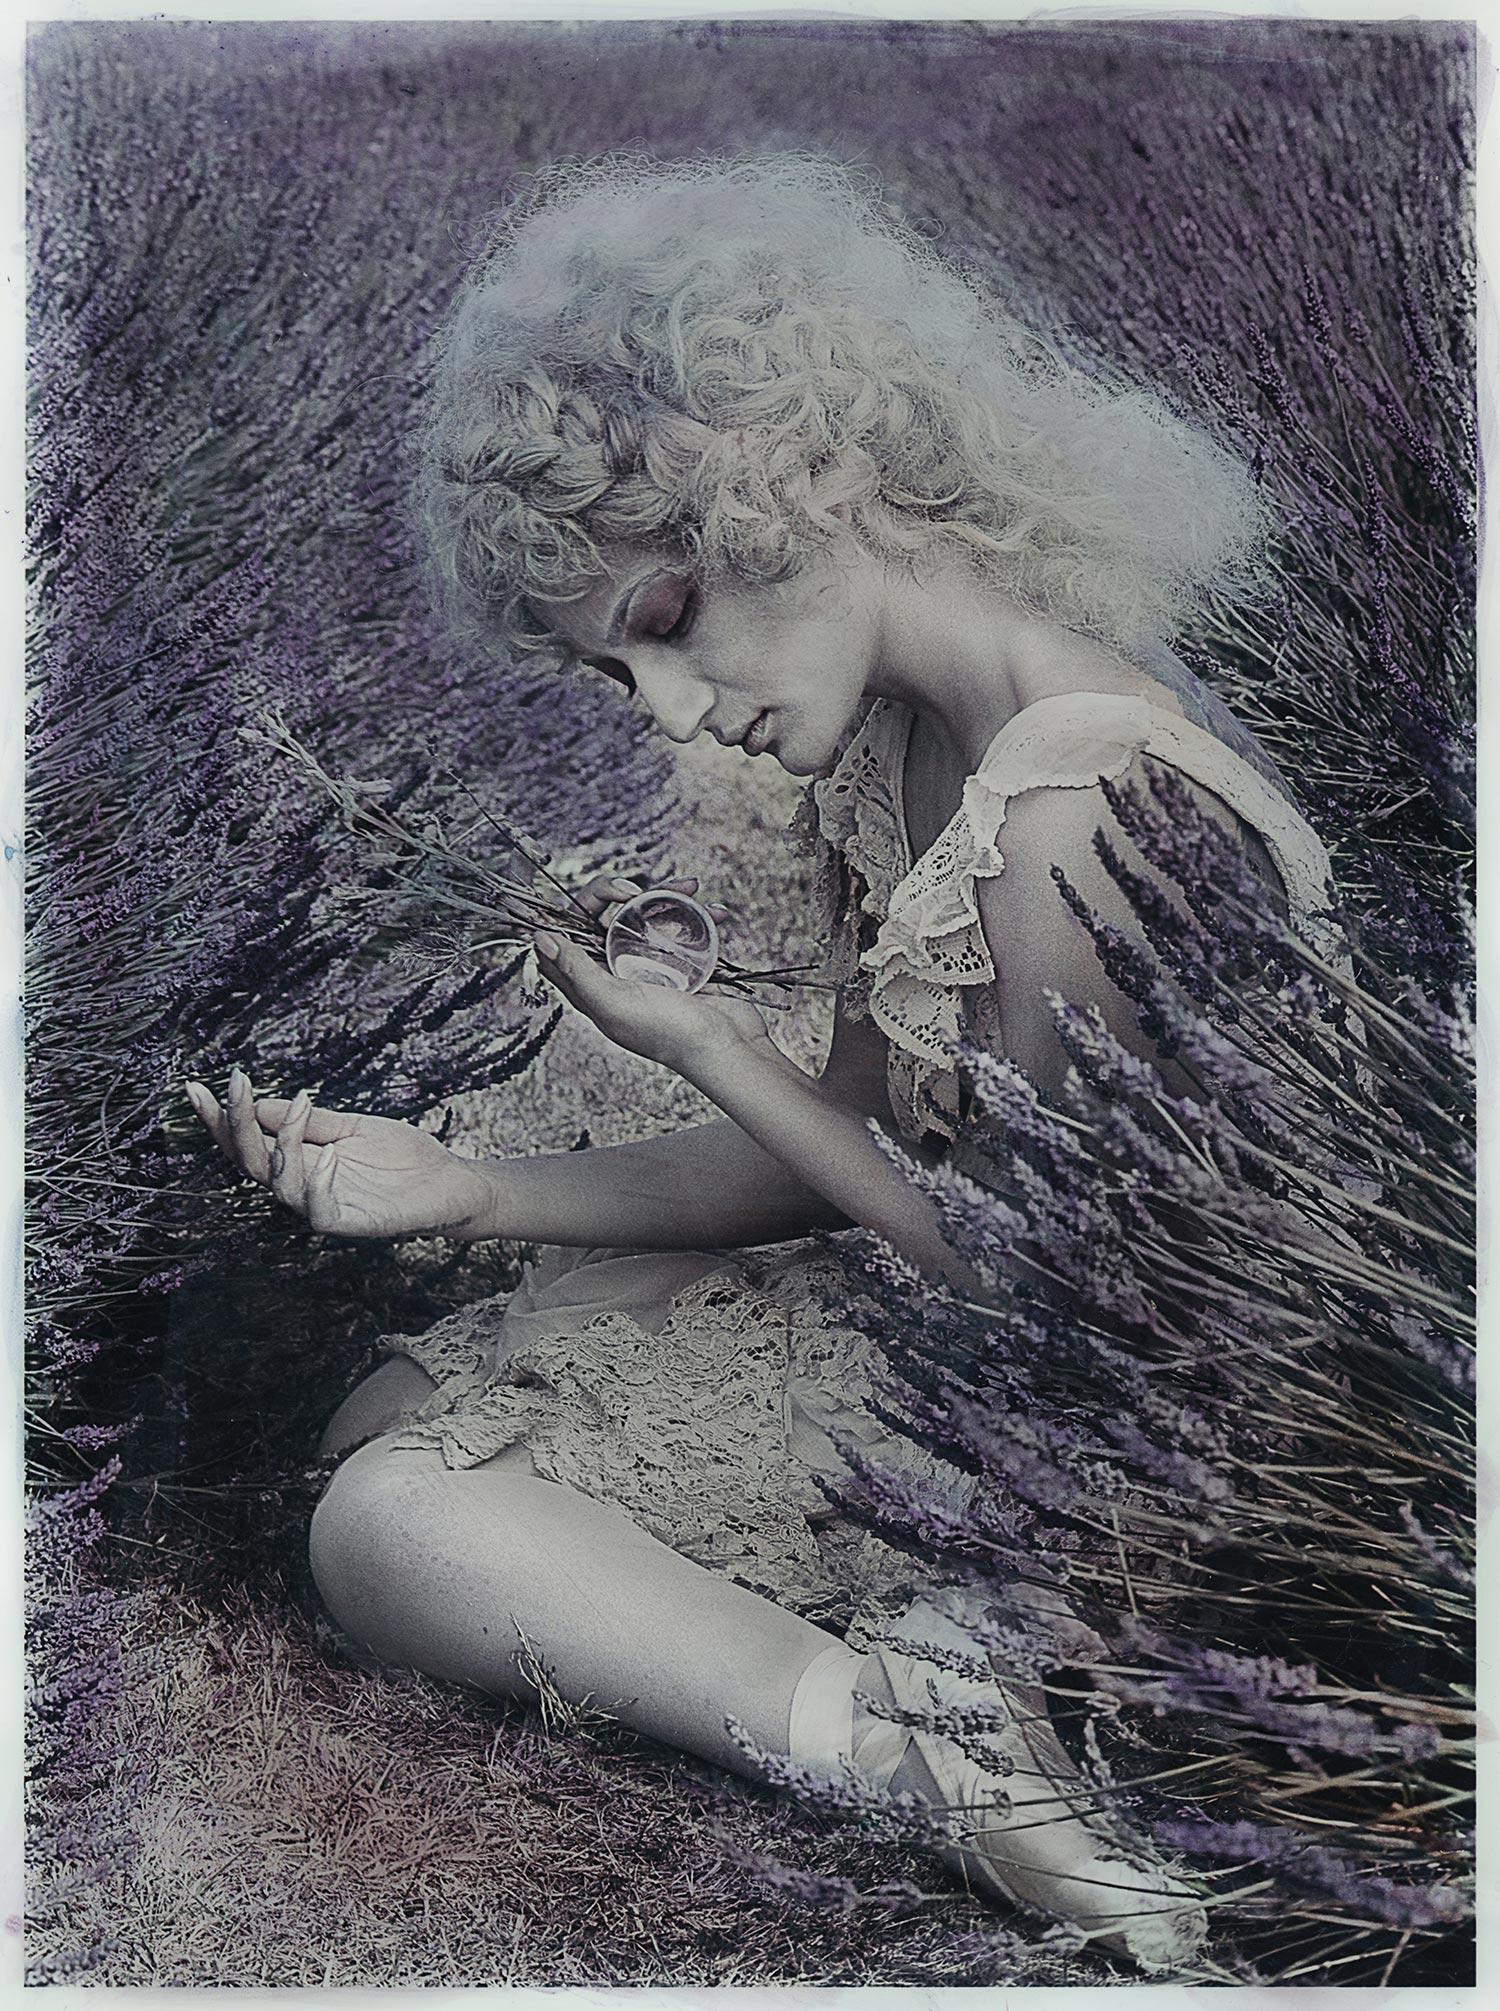 Katie Eleanor, Tigerlily II - ghostly woman